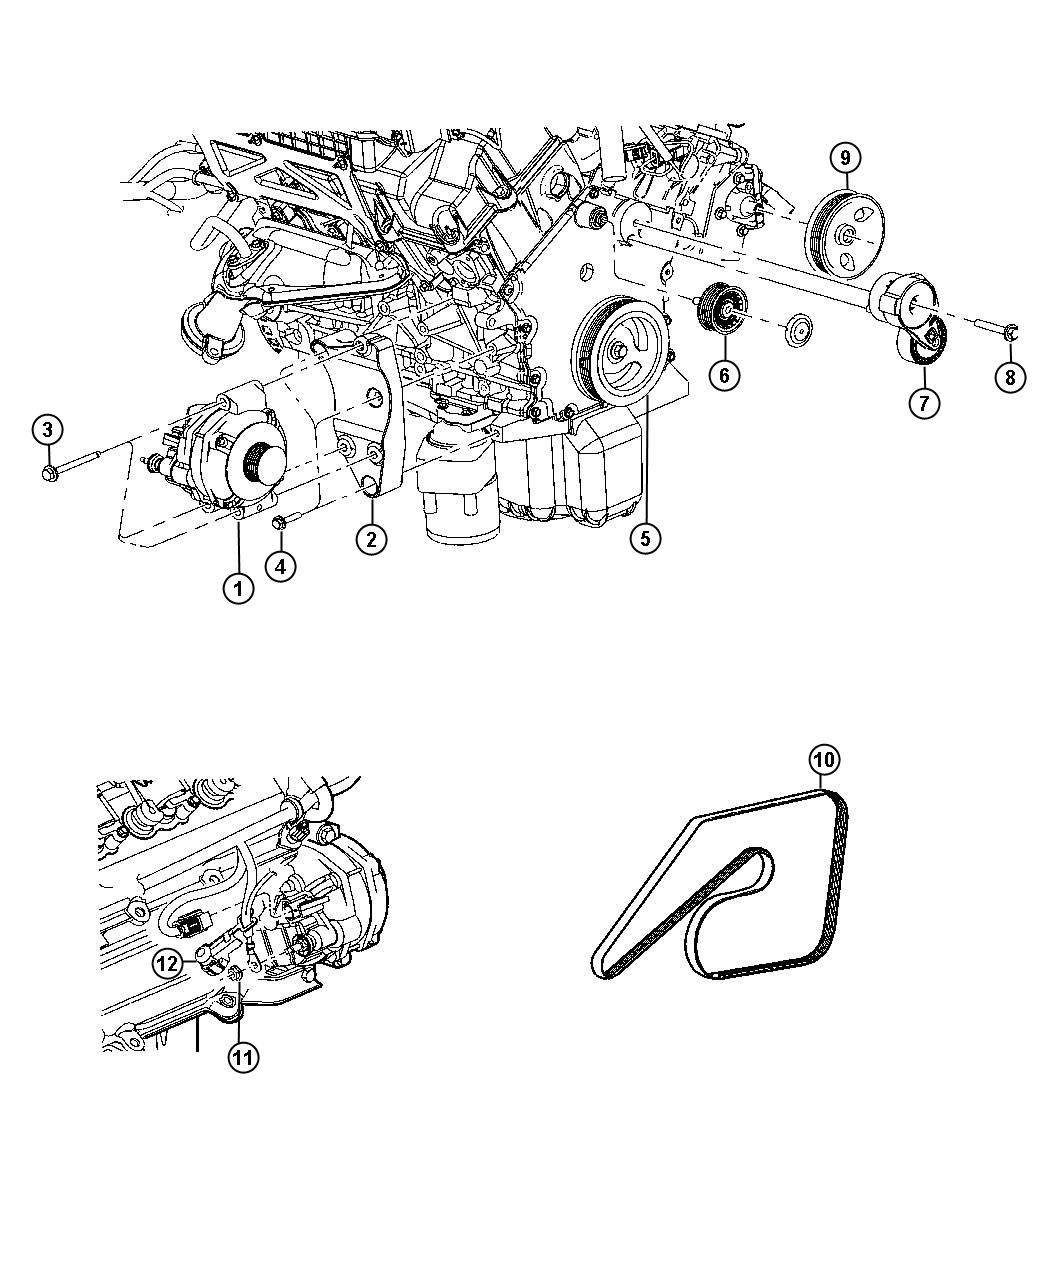 Wiring Diagram 7 Chrysler 300 Serpentine Belt Diagram